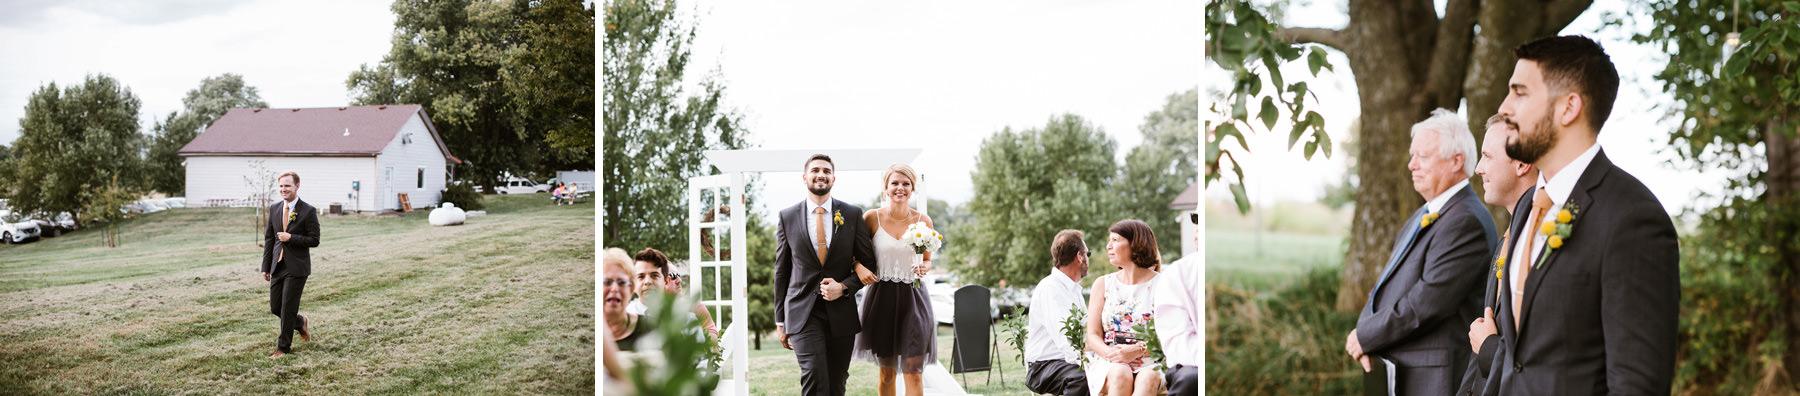 Alldredge Orchard Kansas City_Kindling Wedding Photography BLOG 33.JPG